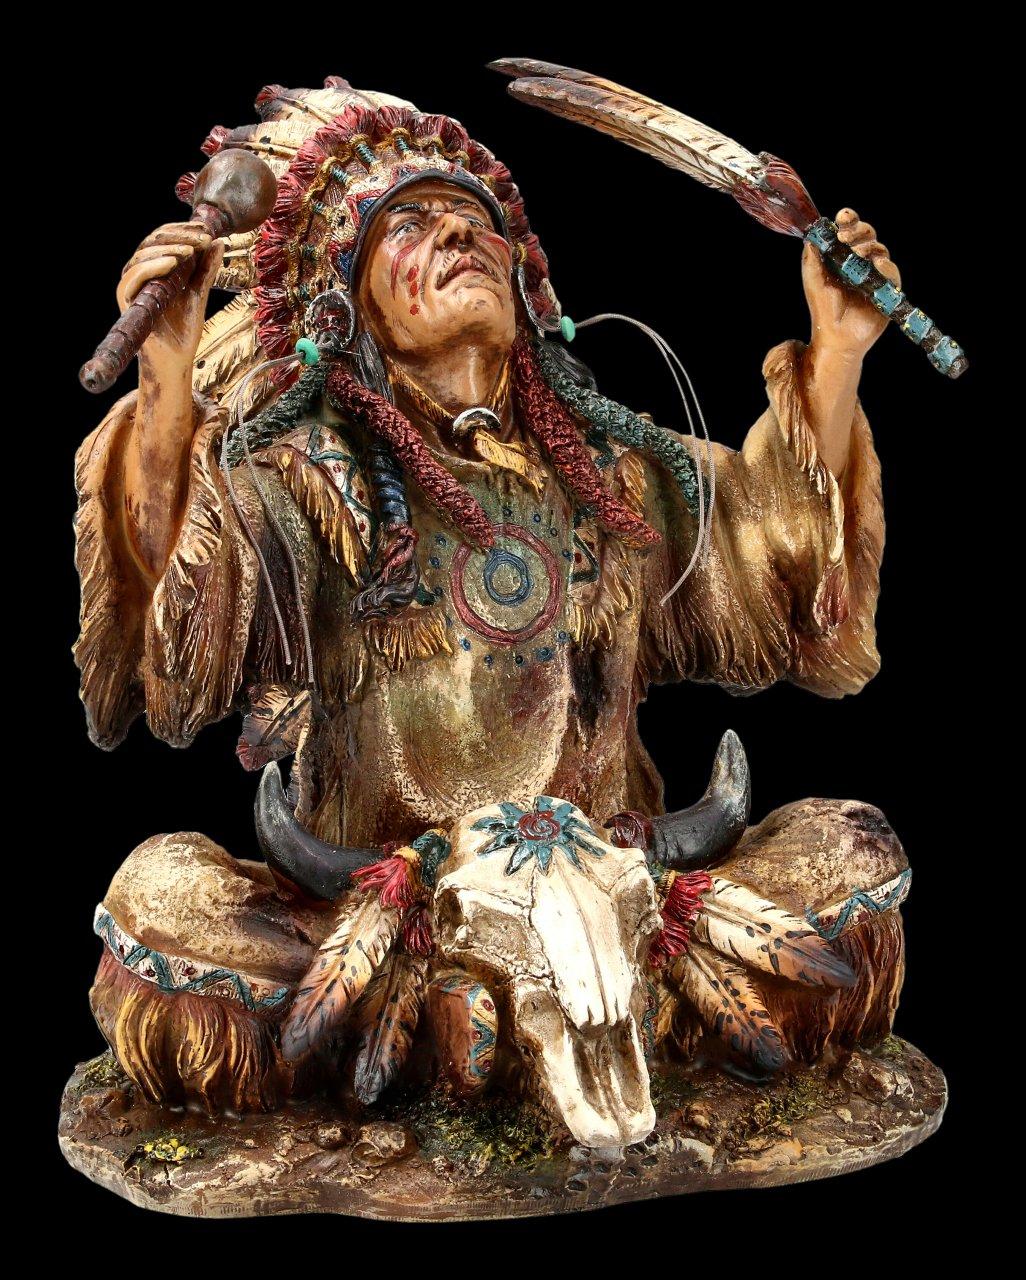 Indianer Figur - Häuptling ruft Götter